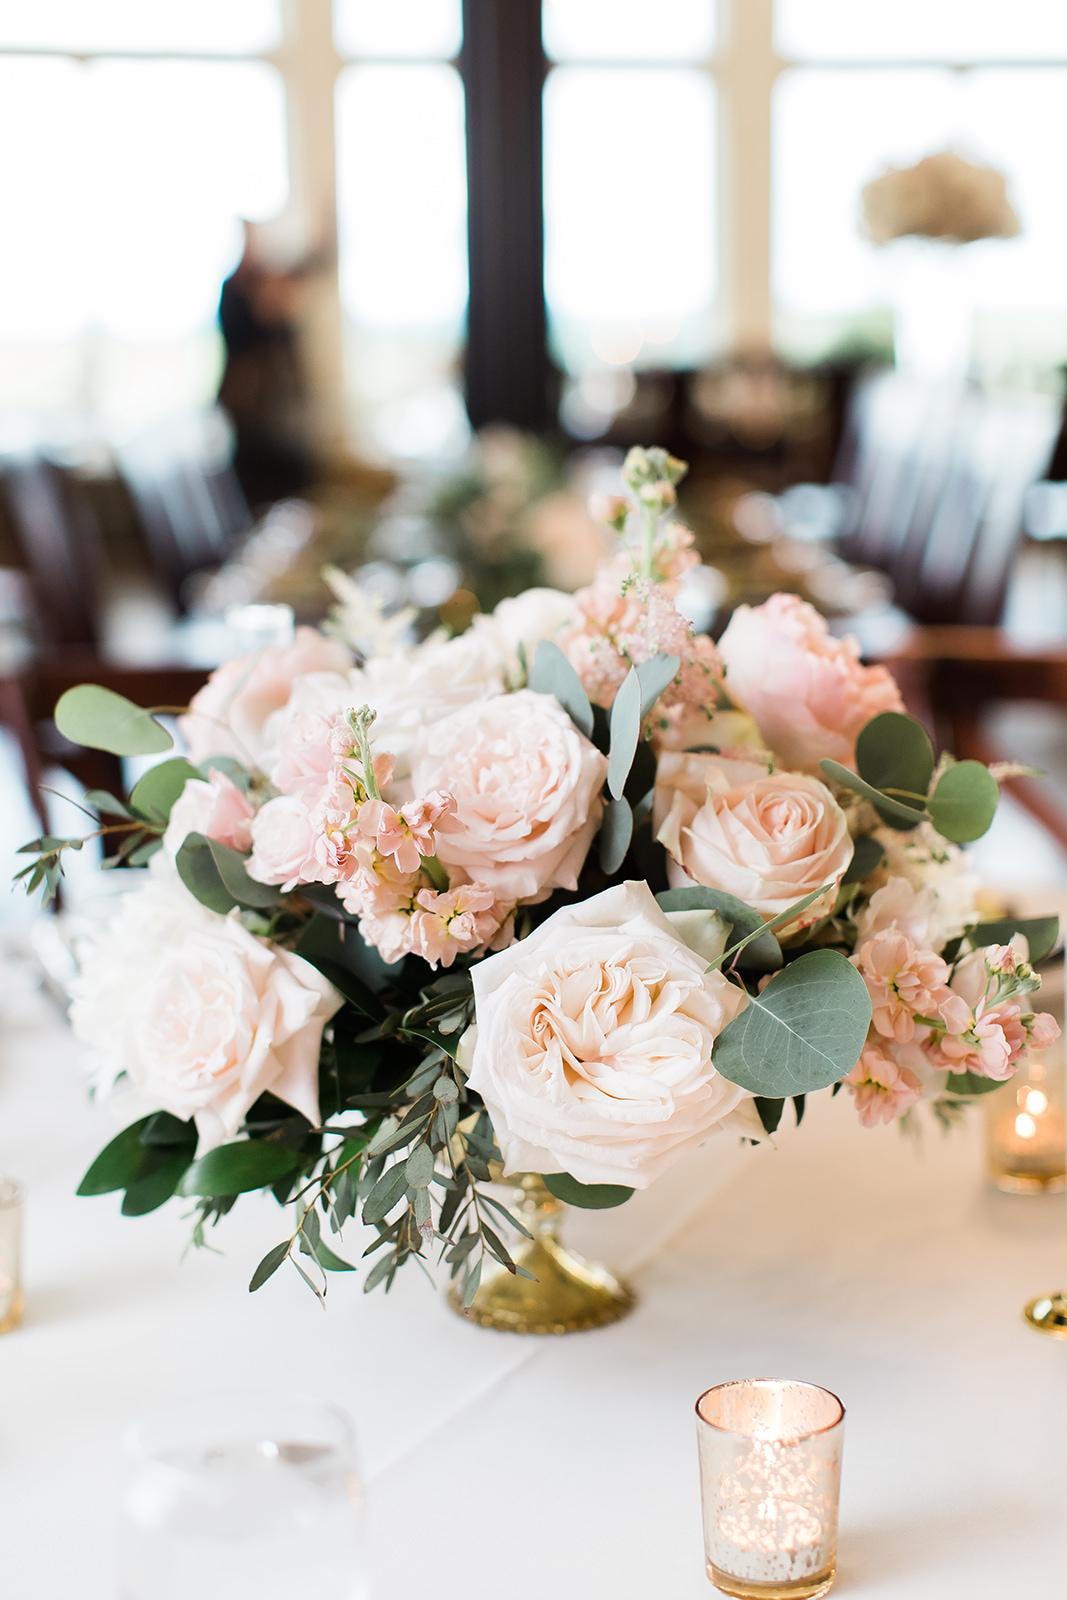 Candice Adelle Photography Charleston Wedding Photographer Virginia Wedding Stone Tower Winery (685 of 1114).jpg